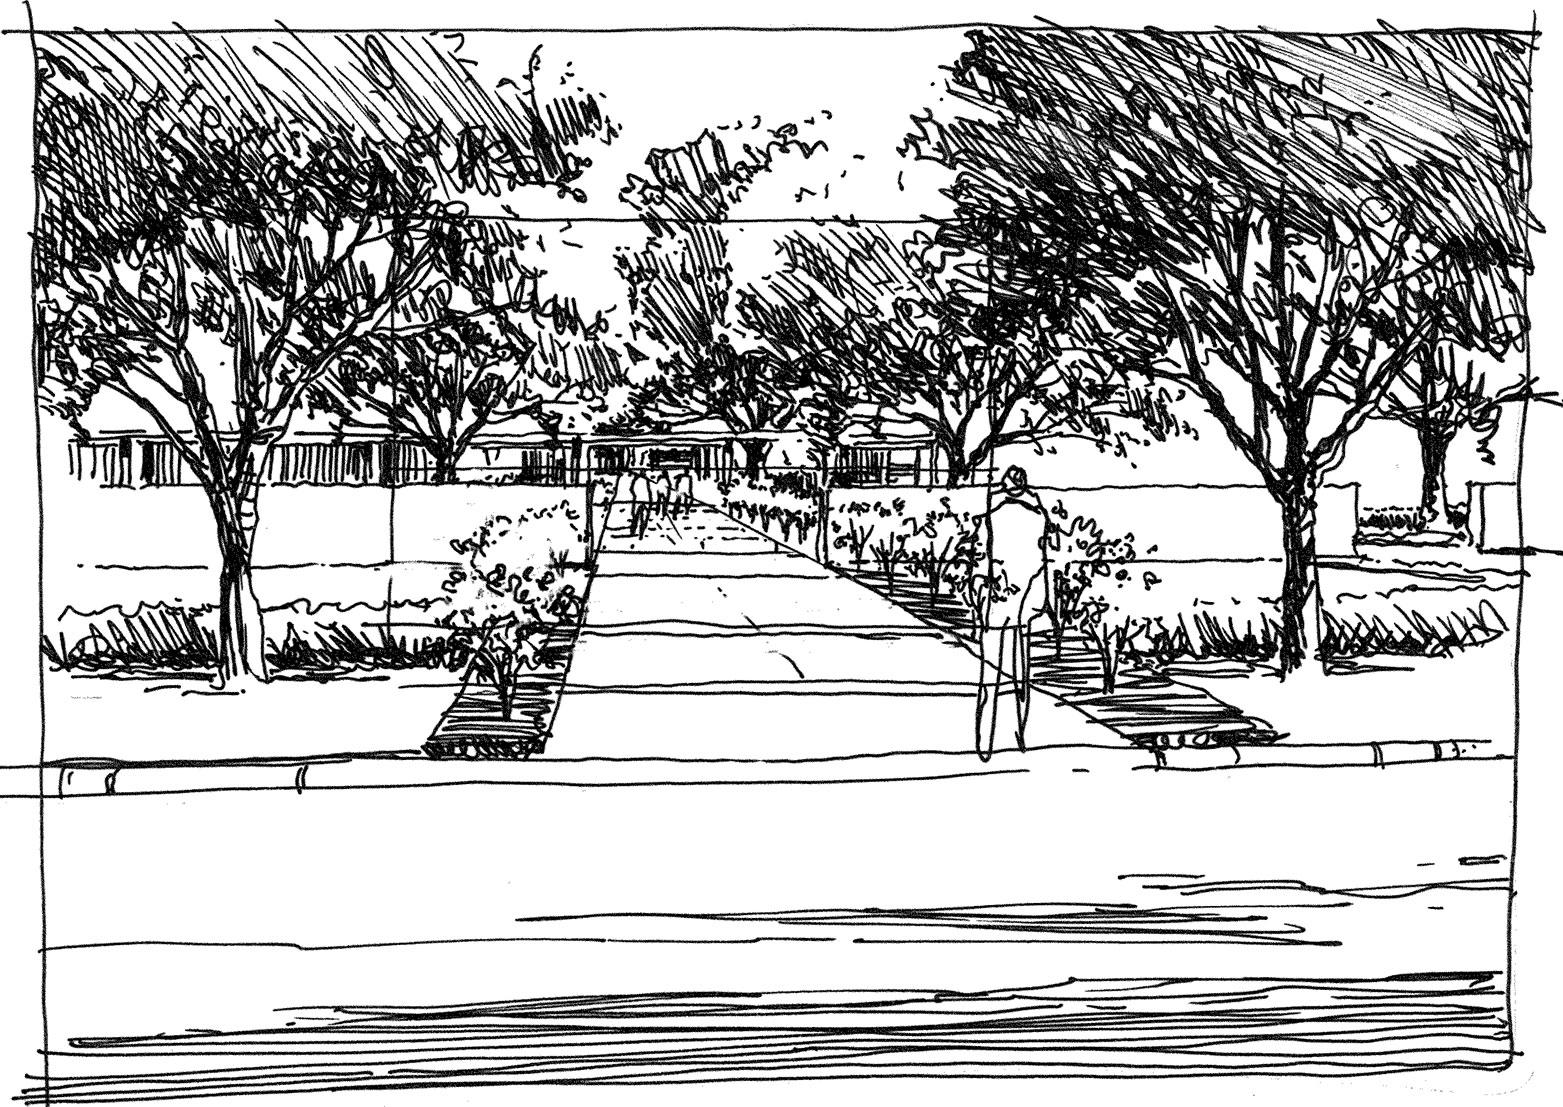 Concept Sketch (B/W)